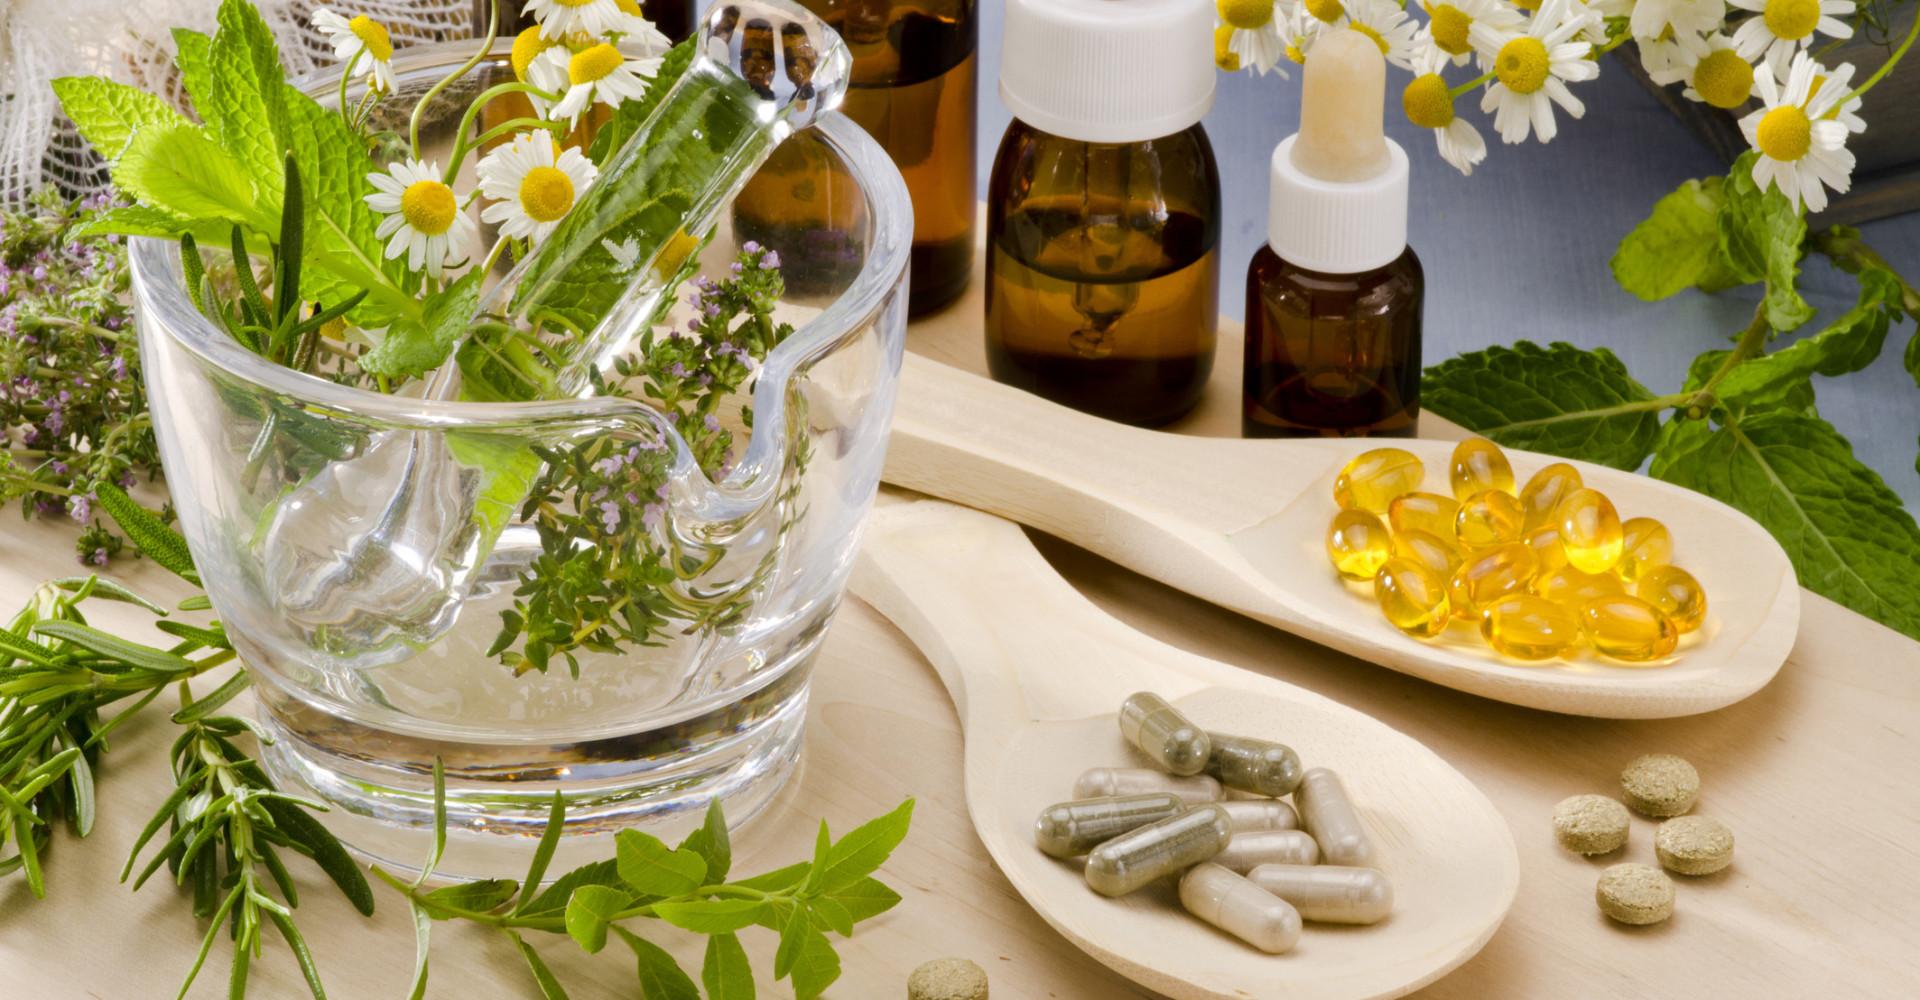 Capillari fragili: ecco 5 rimedi naturali